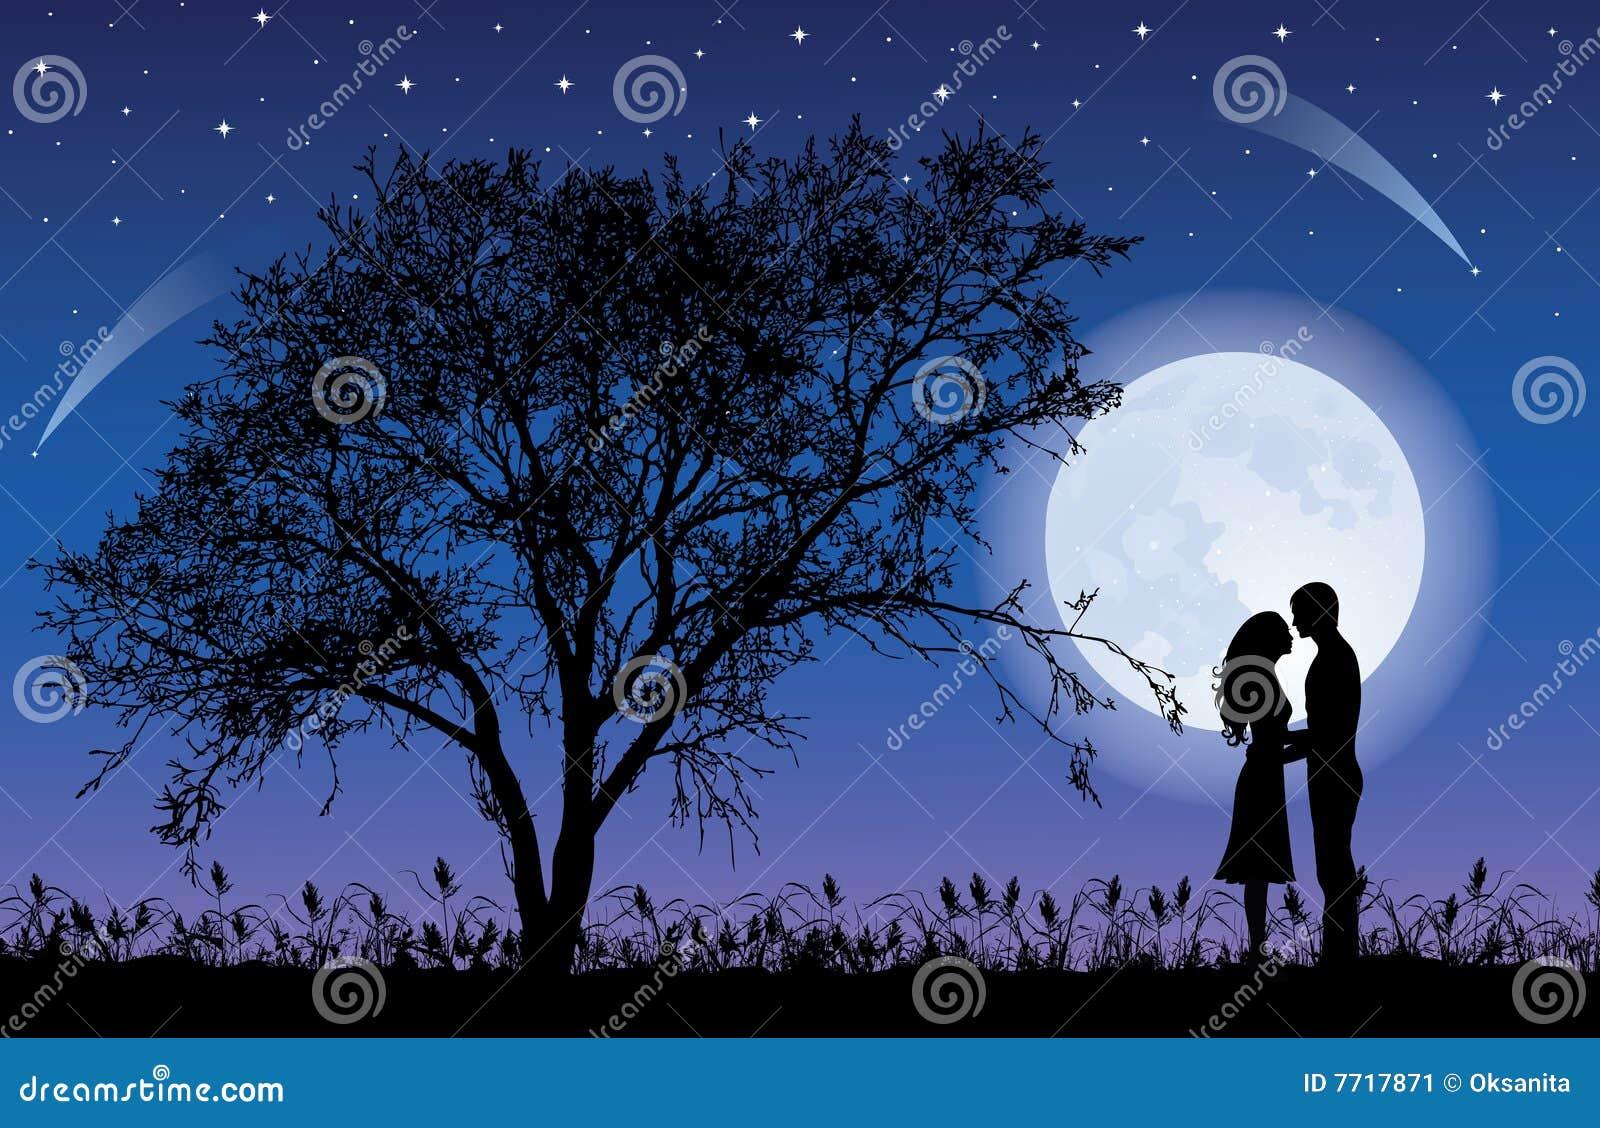 Tree and moon.